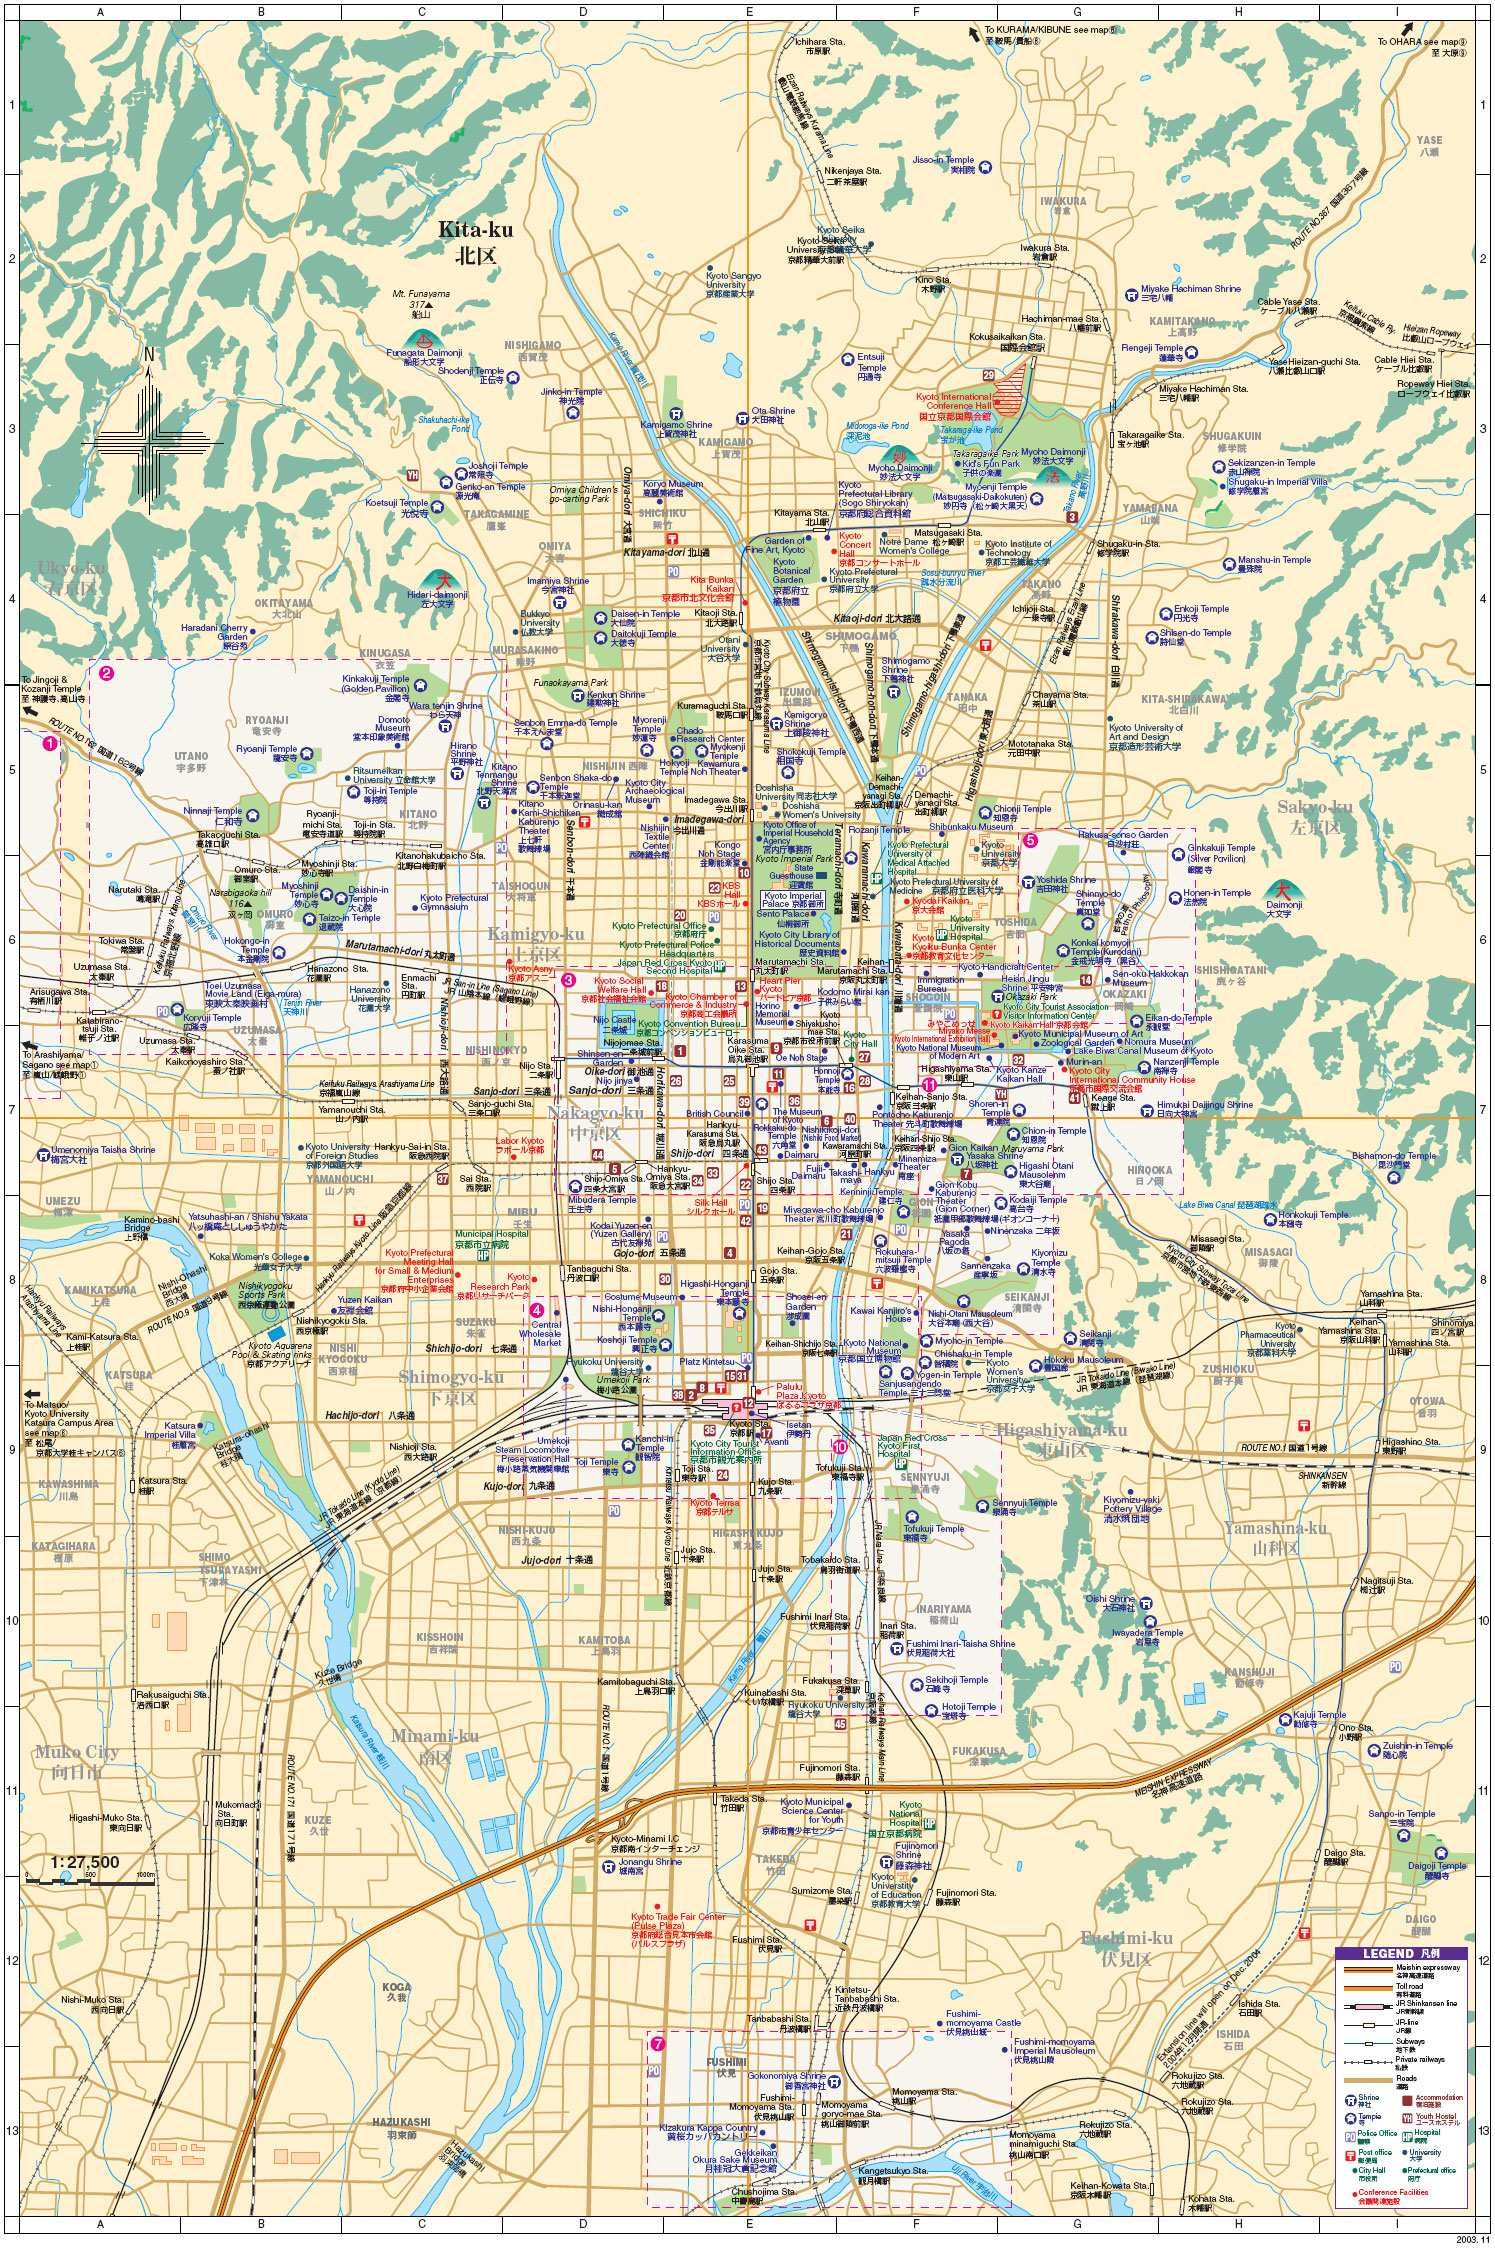 kyoto-map-2.jpg 1,495×2,249 pixels